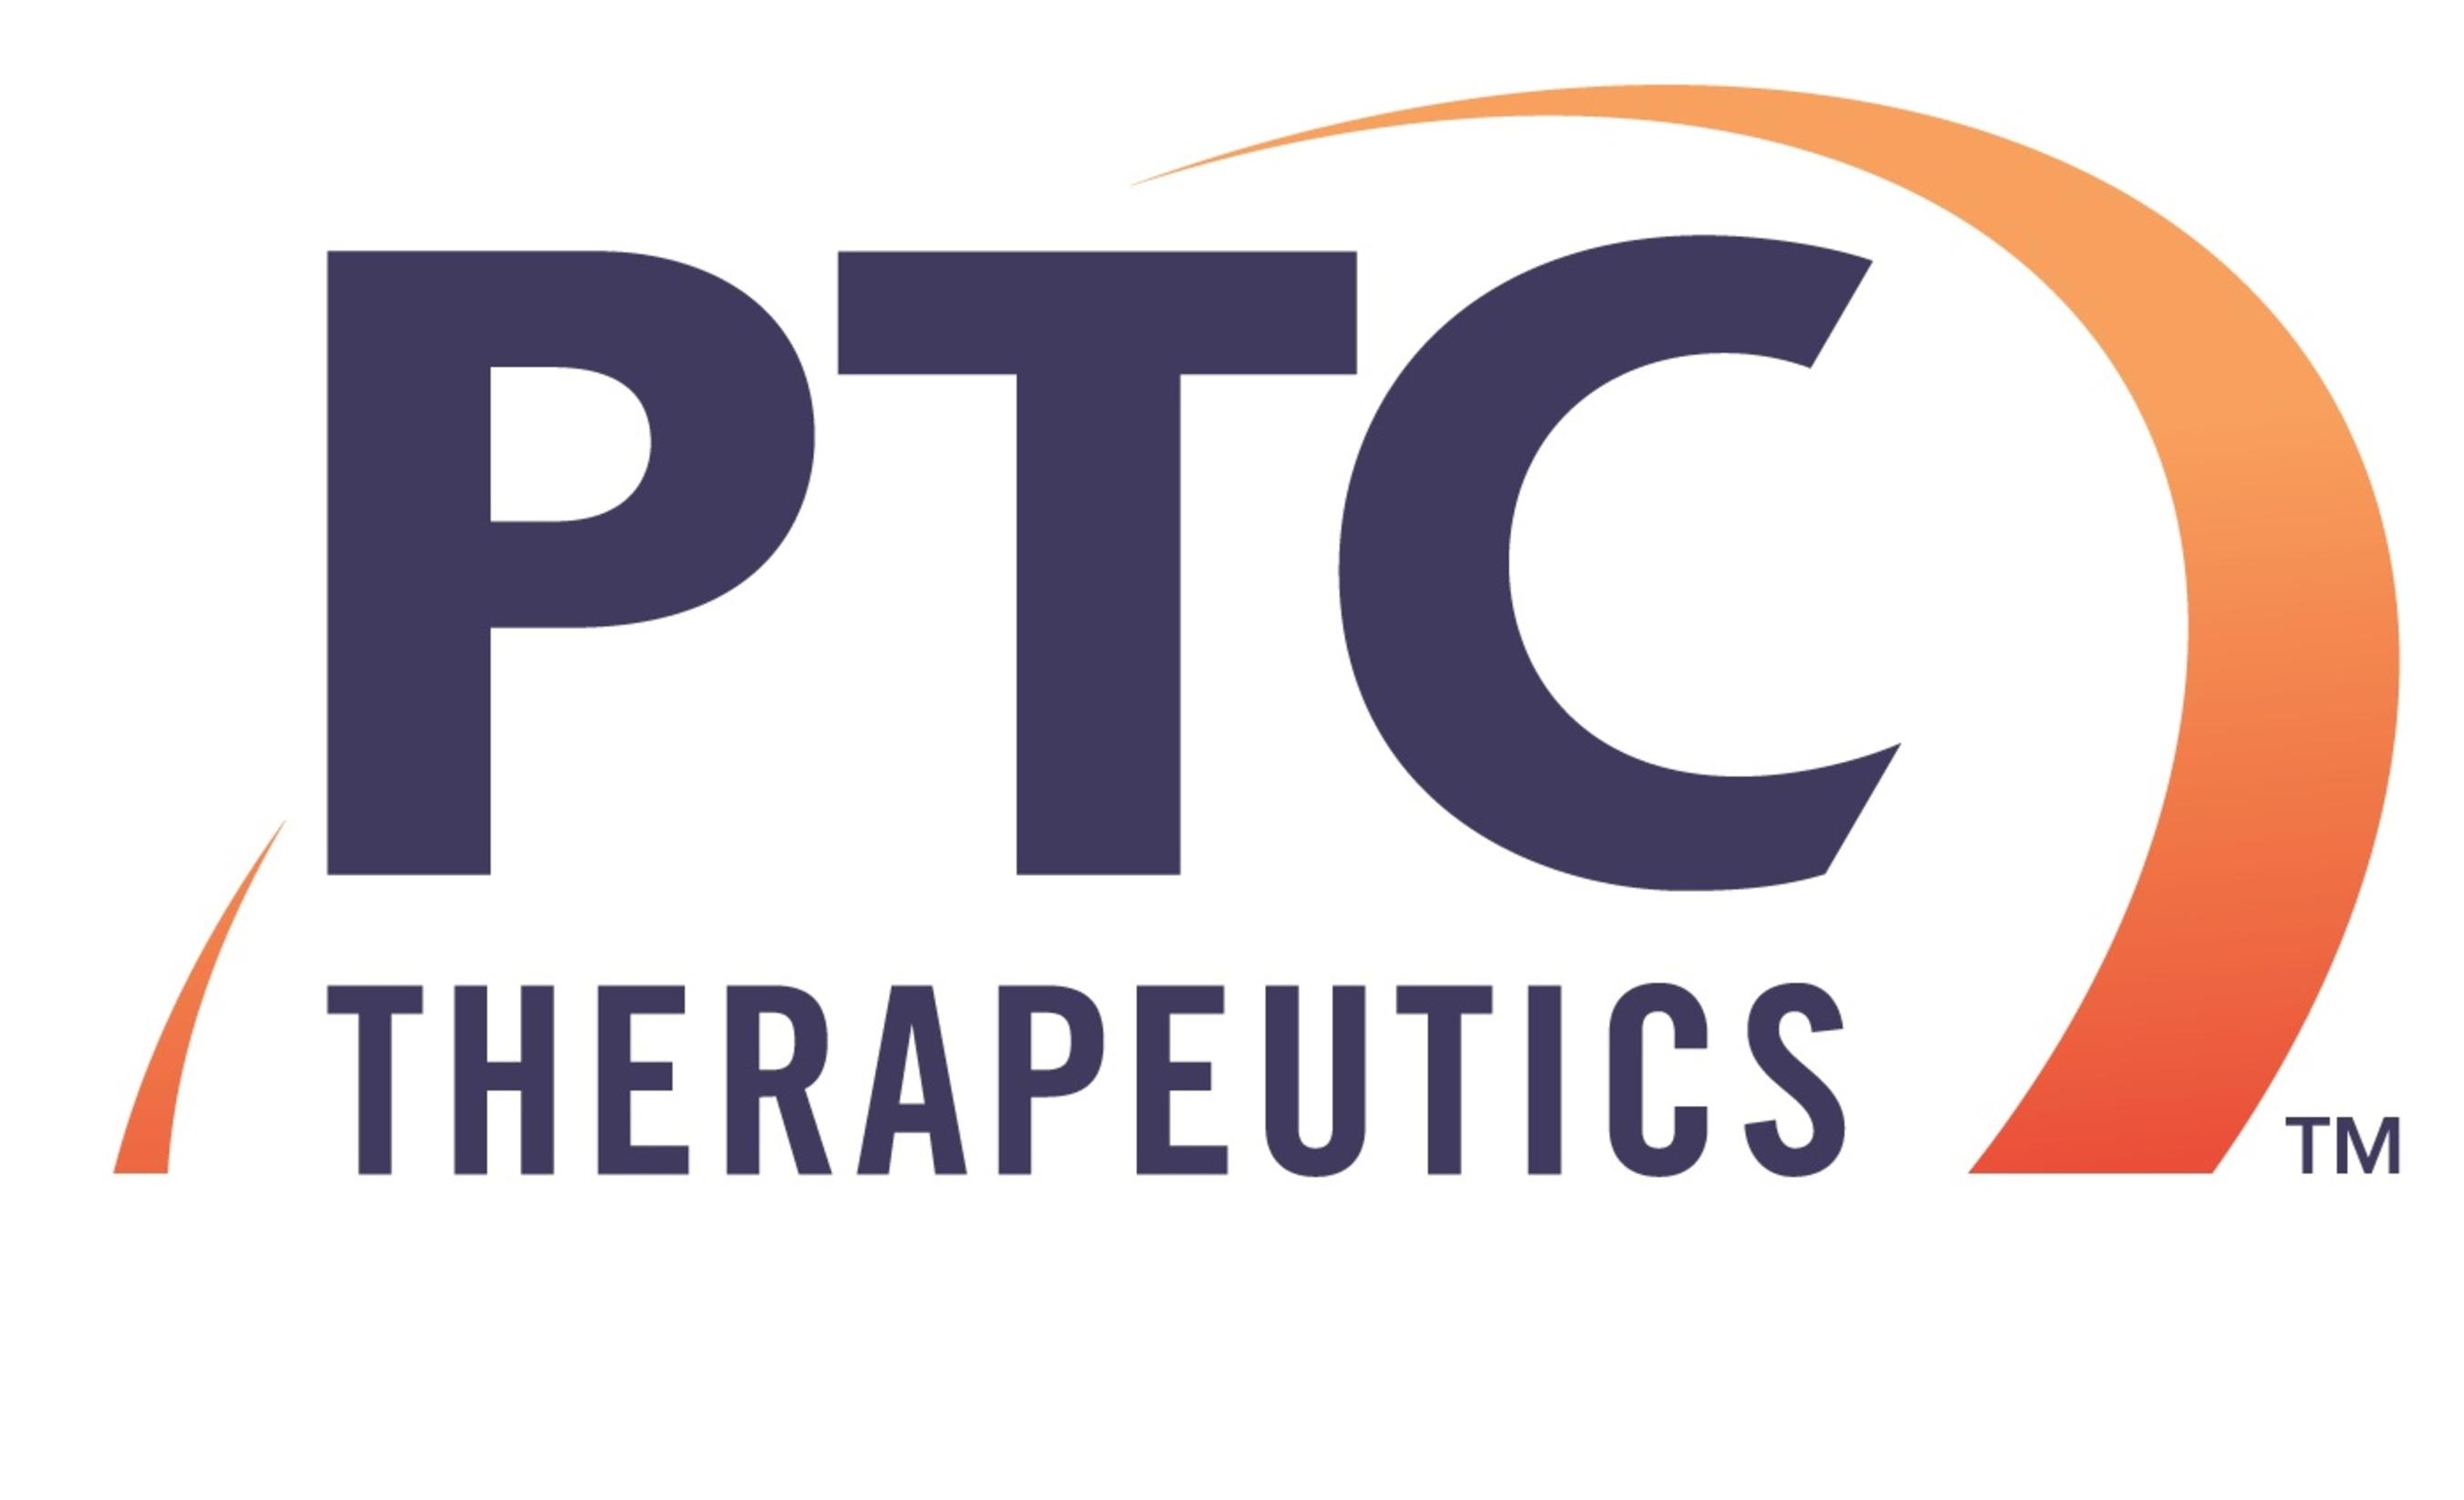 PTC Therapeutics logo. (PRNewsFoto/PTC Therapeutics, Inc.) (PRNewsFoto/)